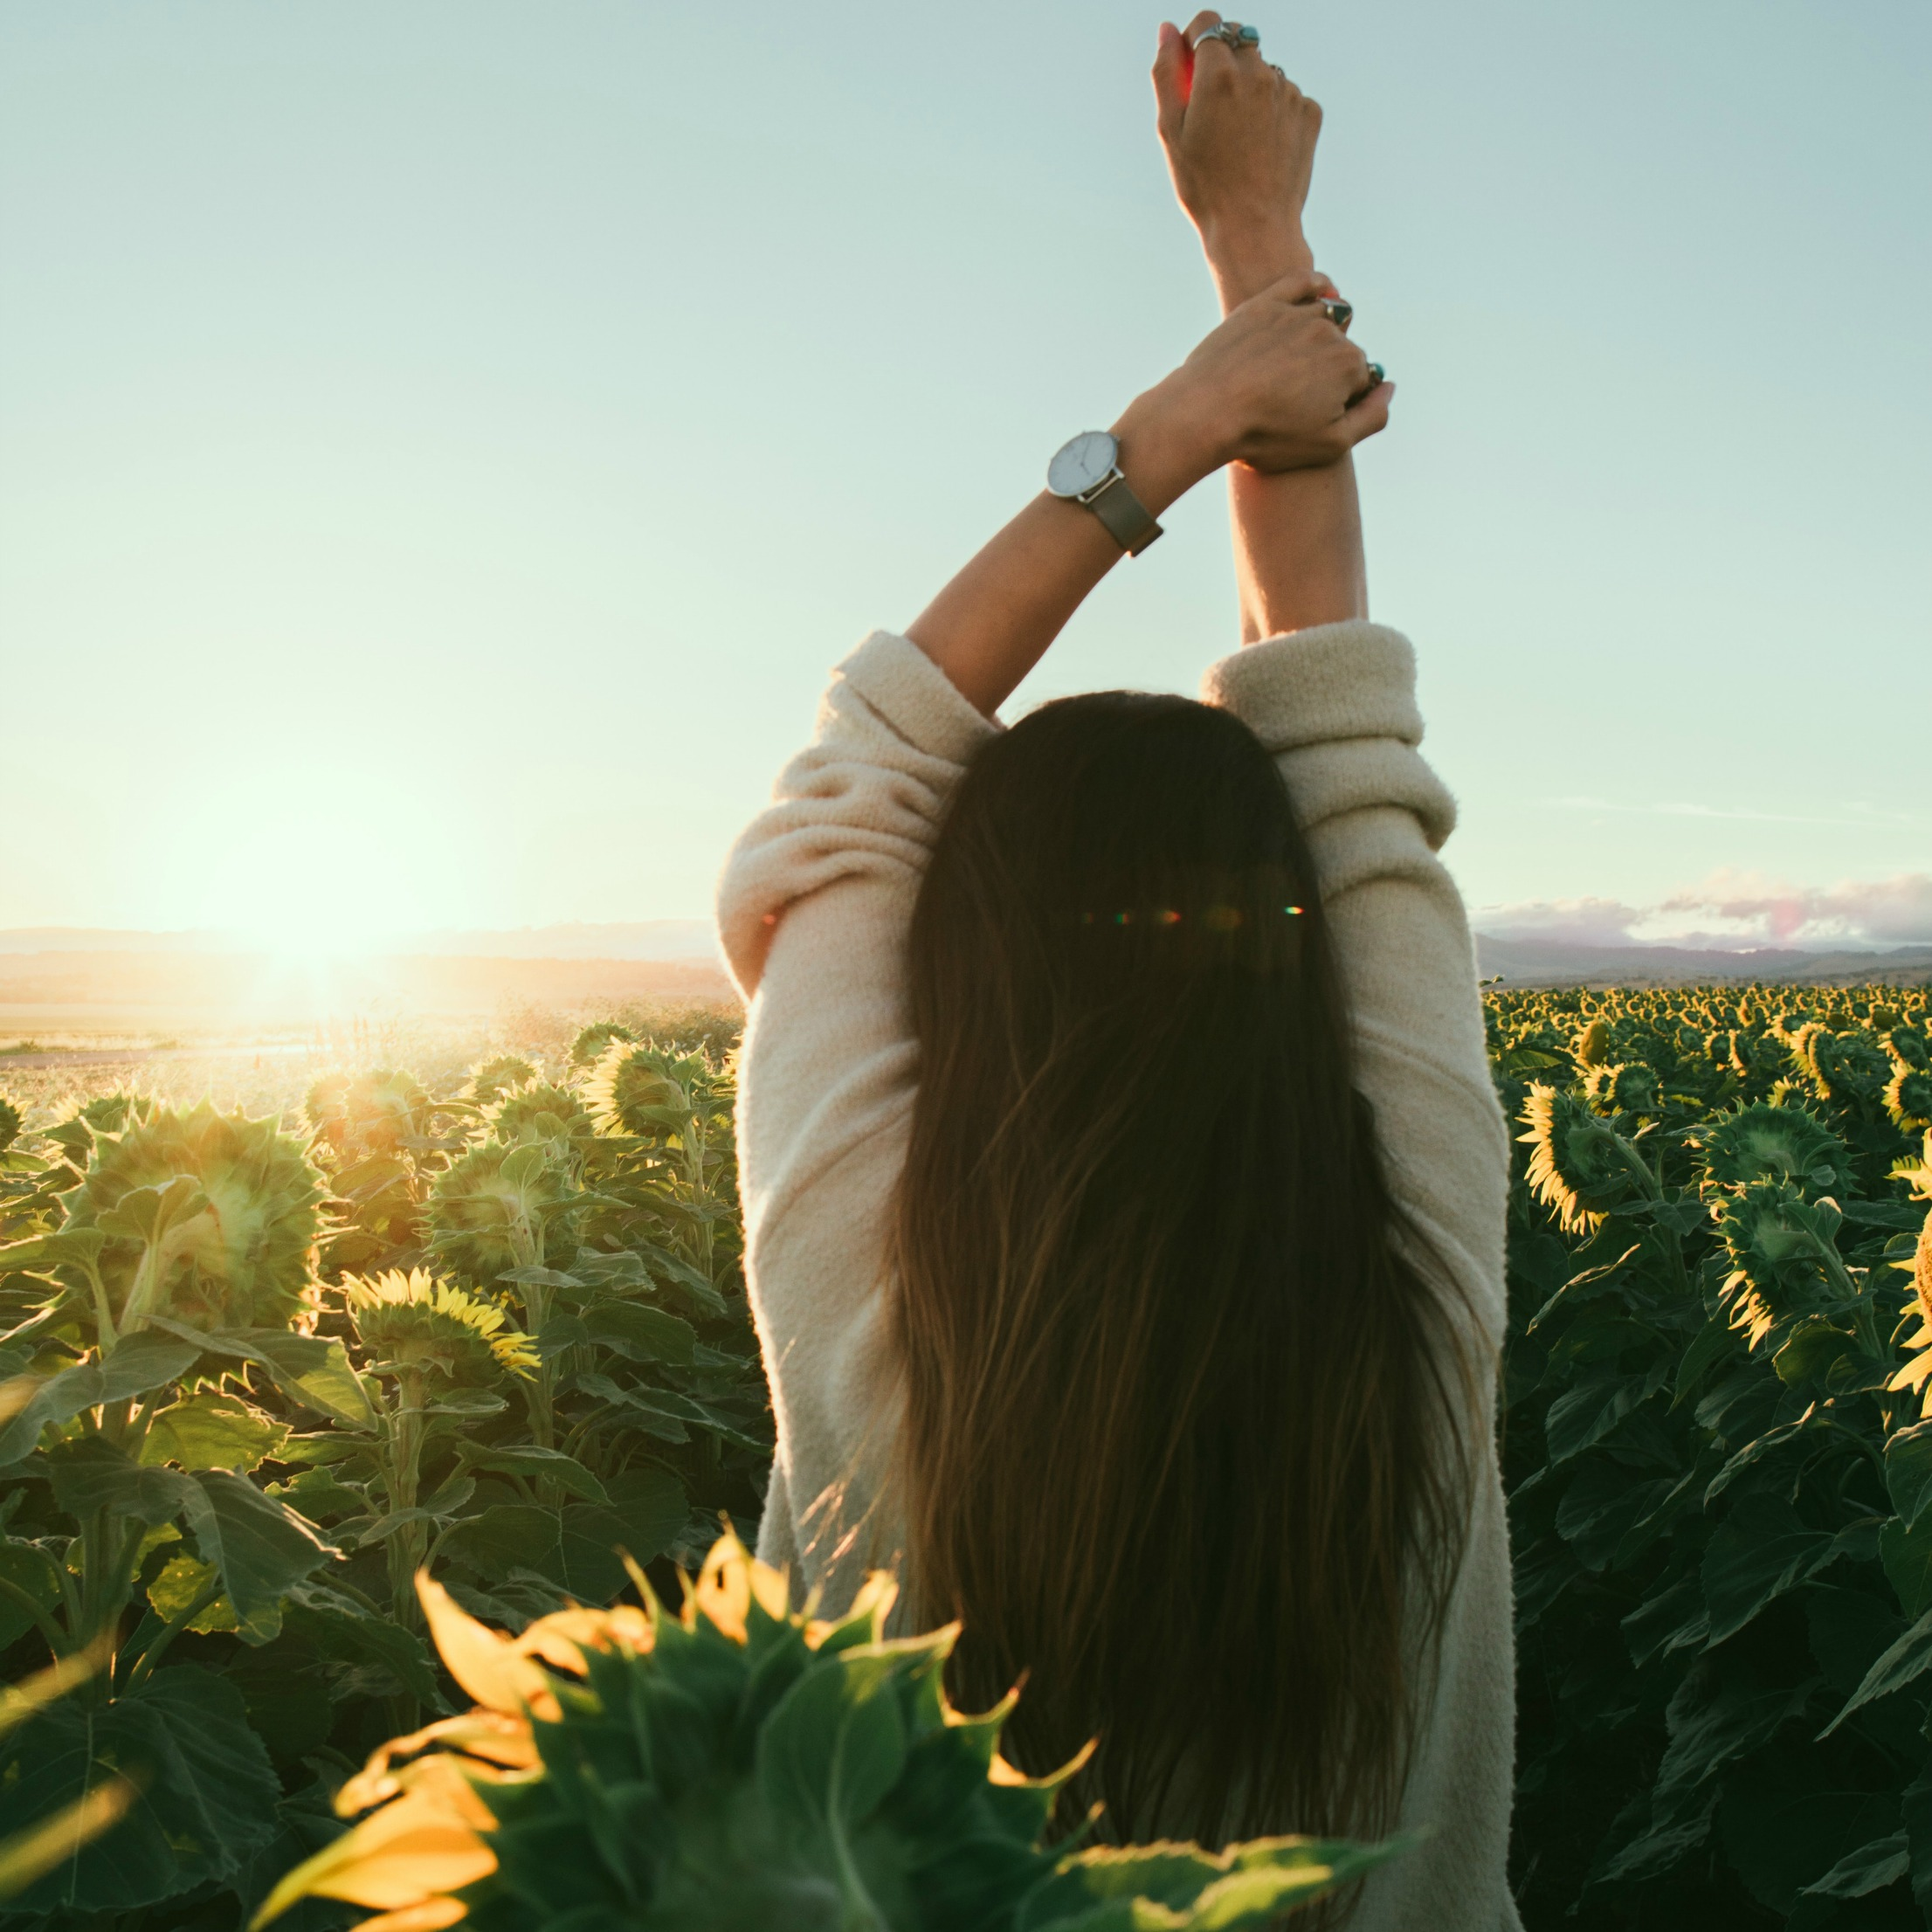 sunflowers_Crop.jpg